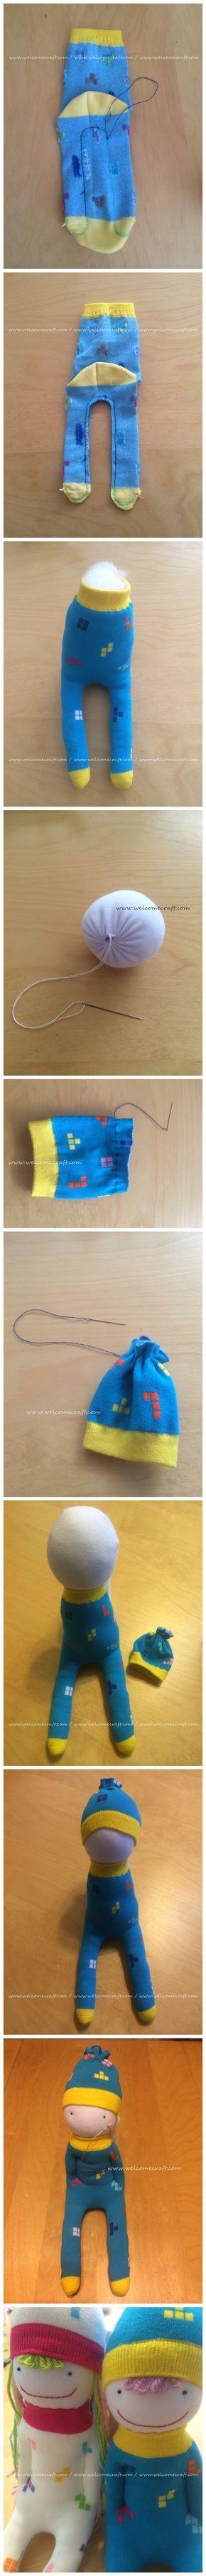 Hoe to make socks dolls DIY step by step tutorial instruction                                                                                                                                                                                 More